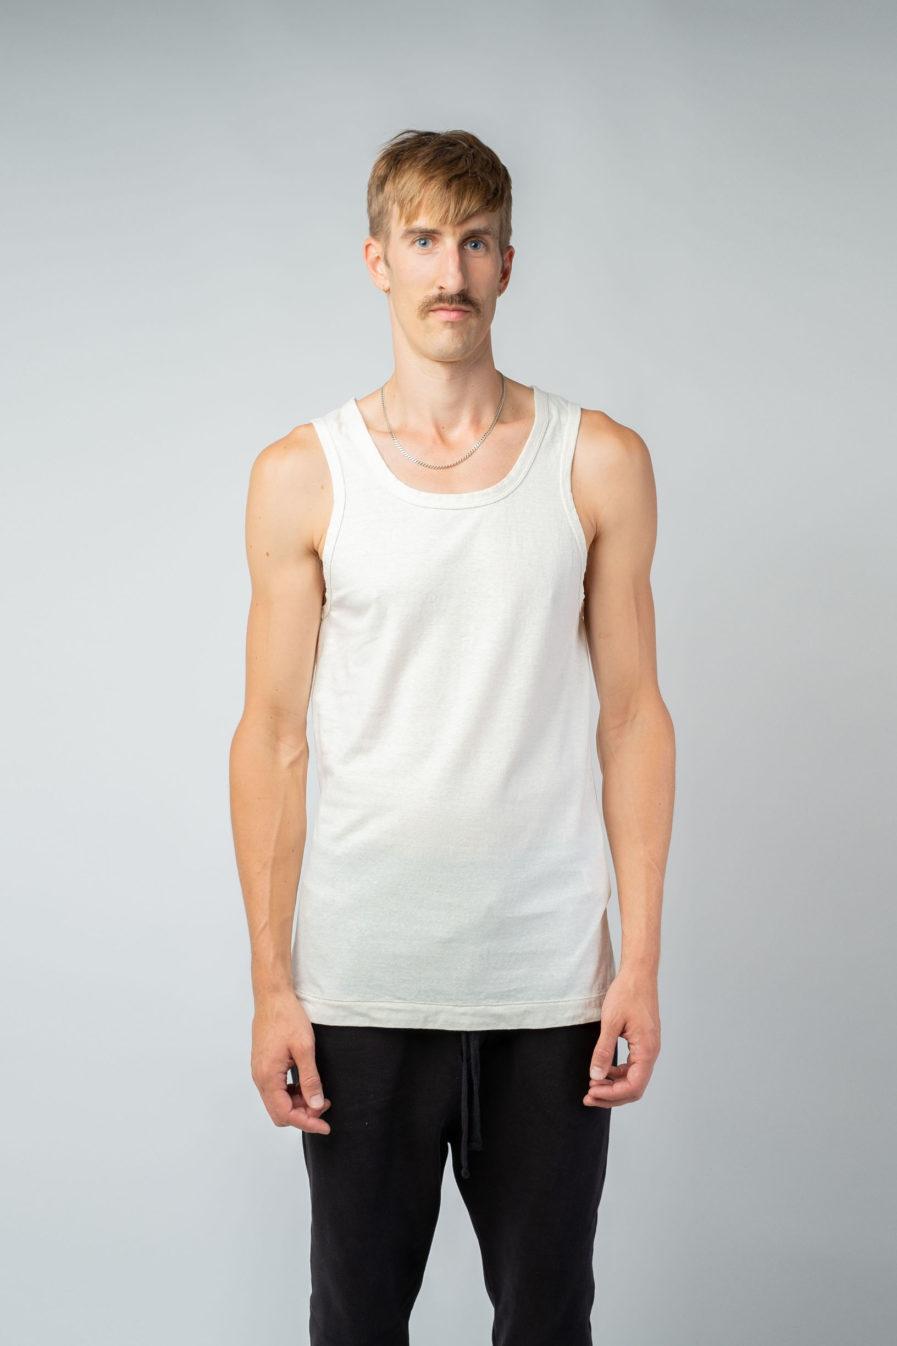 MAN unisex singlet tanktop hemp organic cotton SONNY Blank canvas front